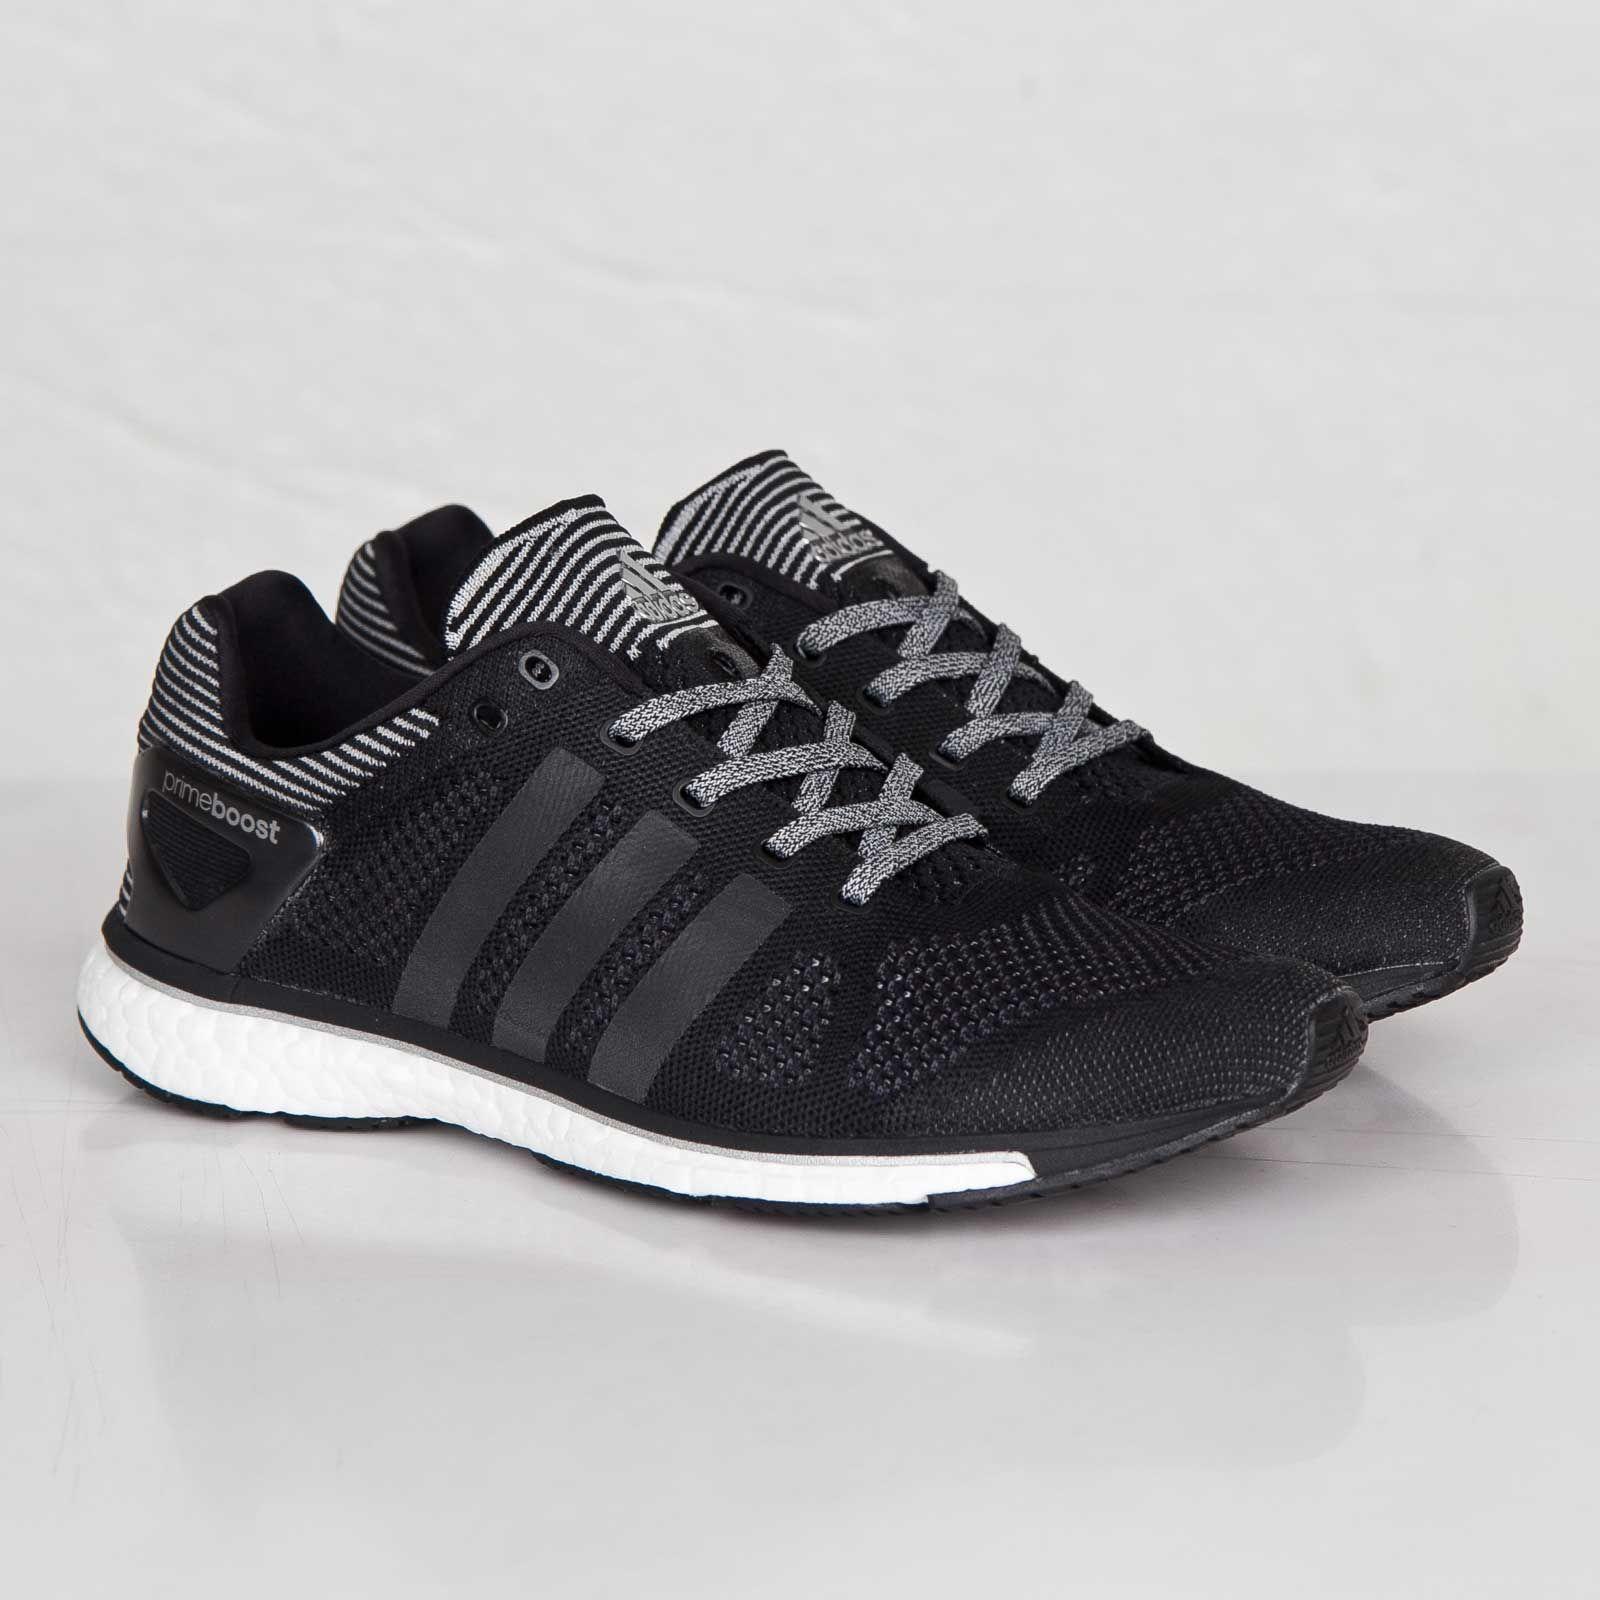 premium selection c0580 73585 Adidas Lifestyle Adizero Prime Lt Shoes Men Green White International Brand